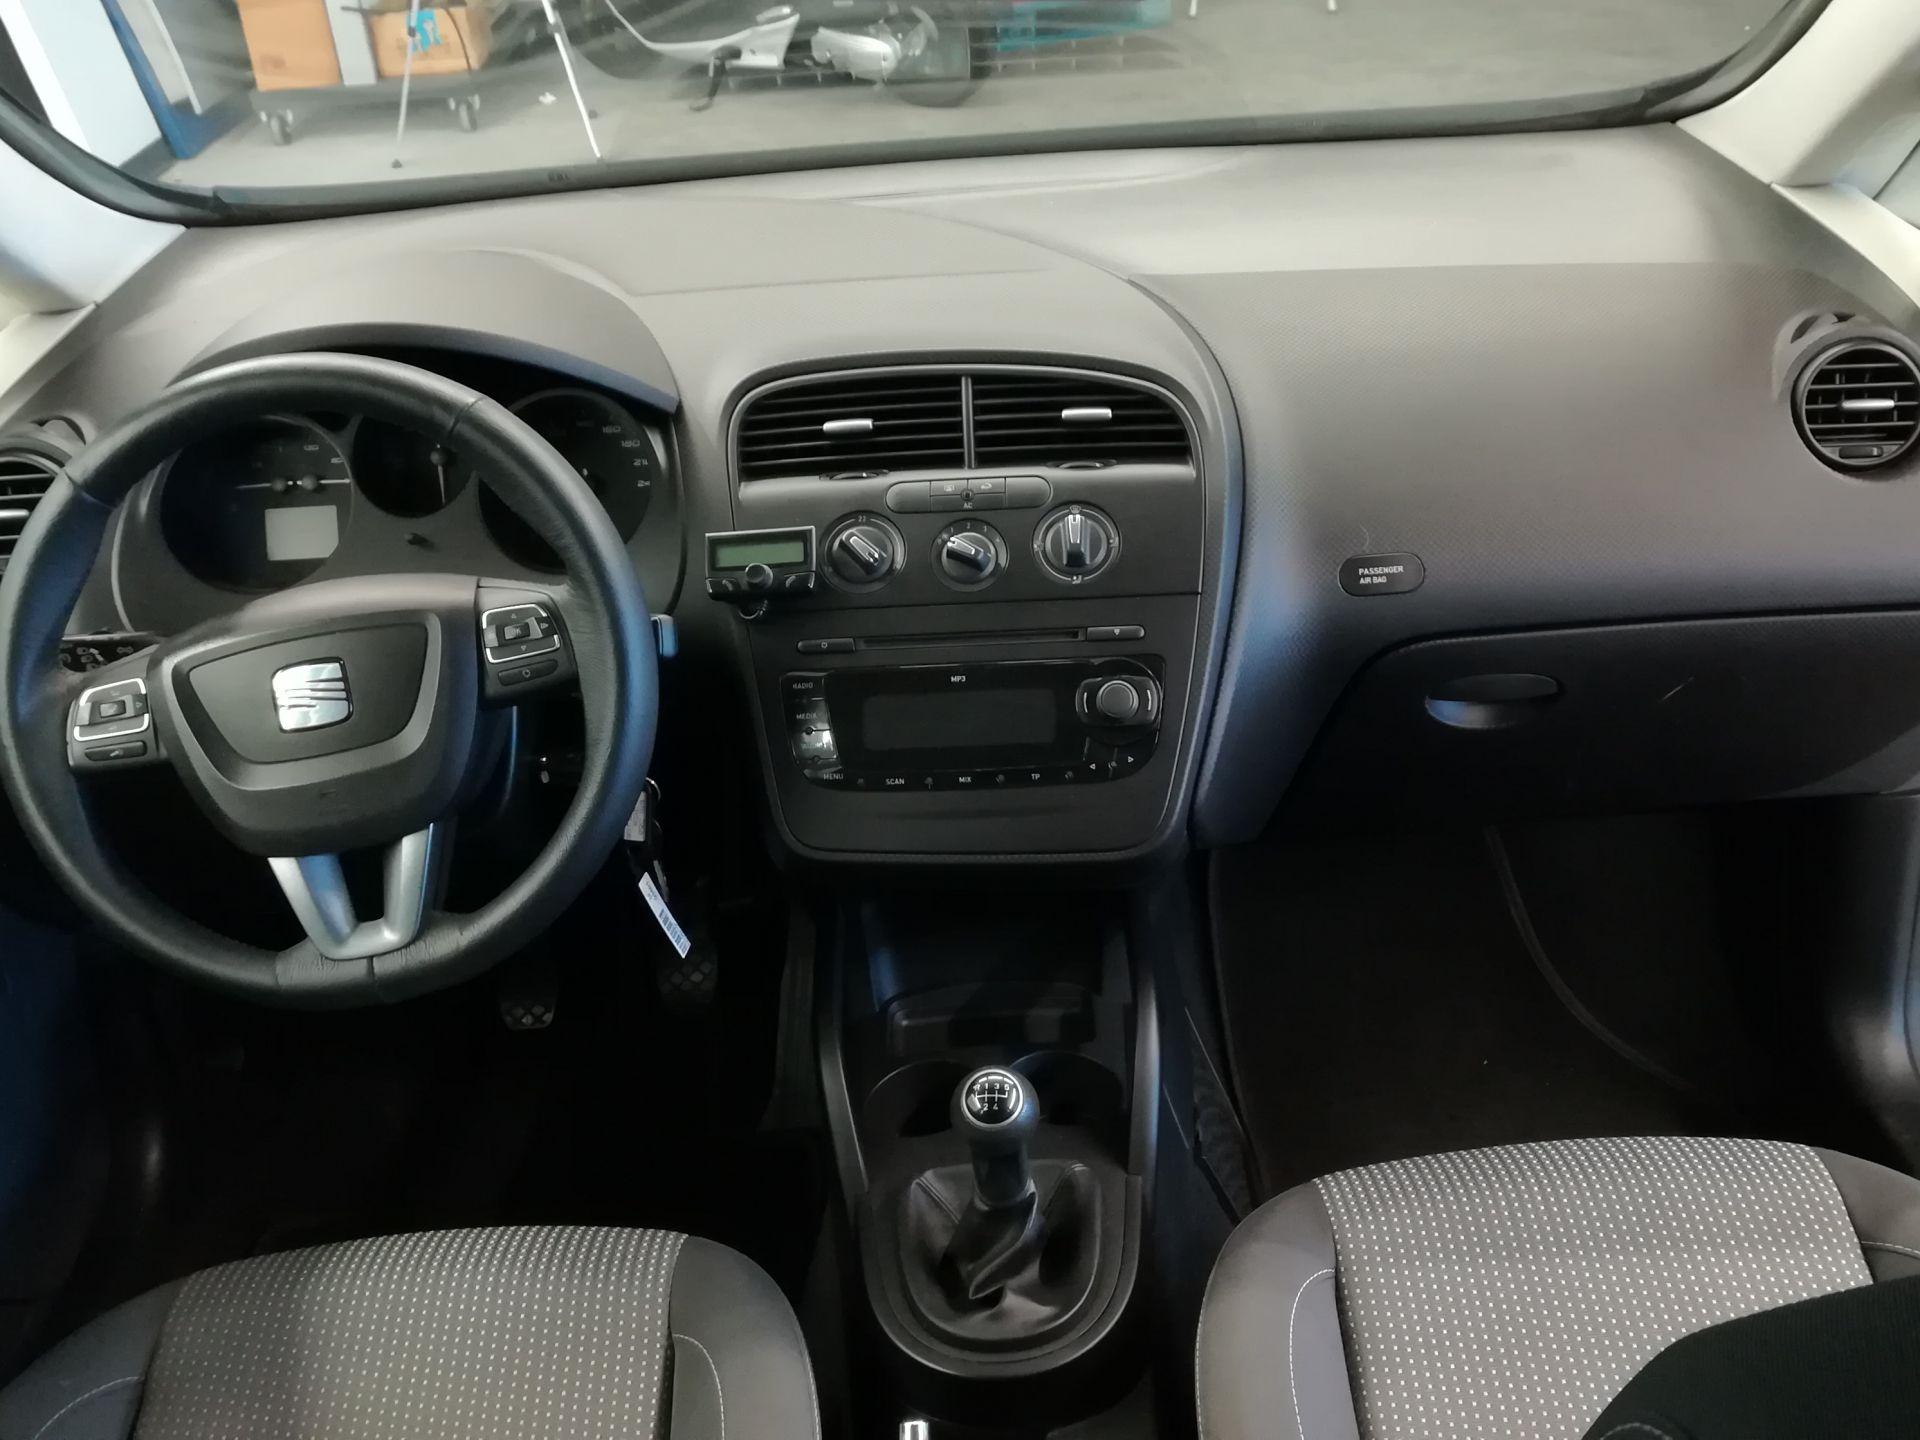 SEAT Altea 1.6 TDI 105cv Reference Ecomotive